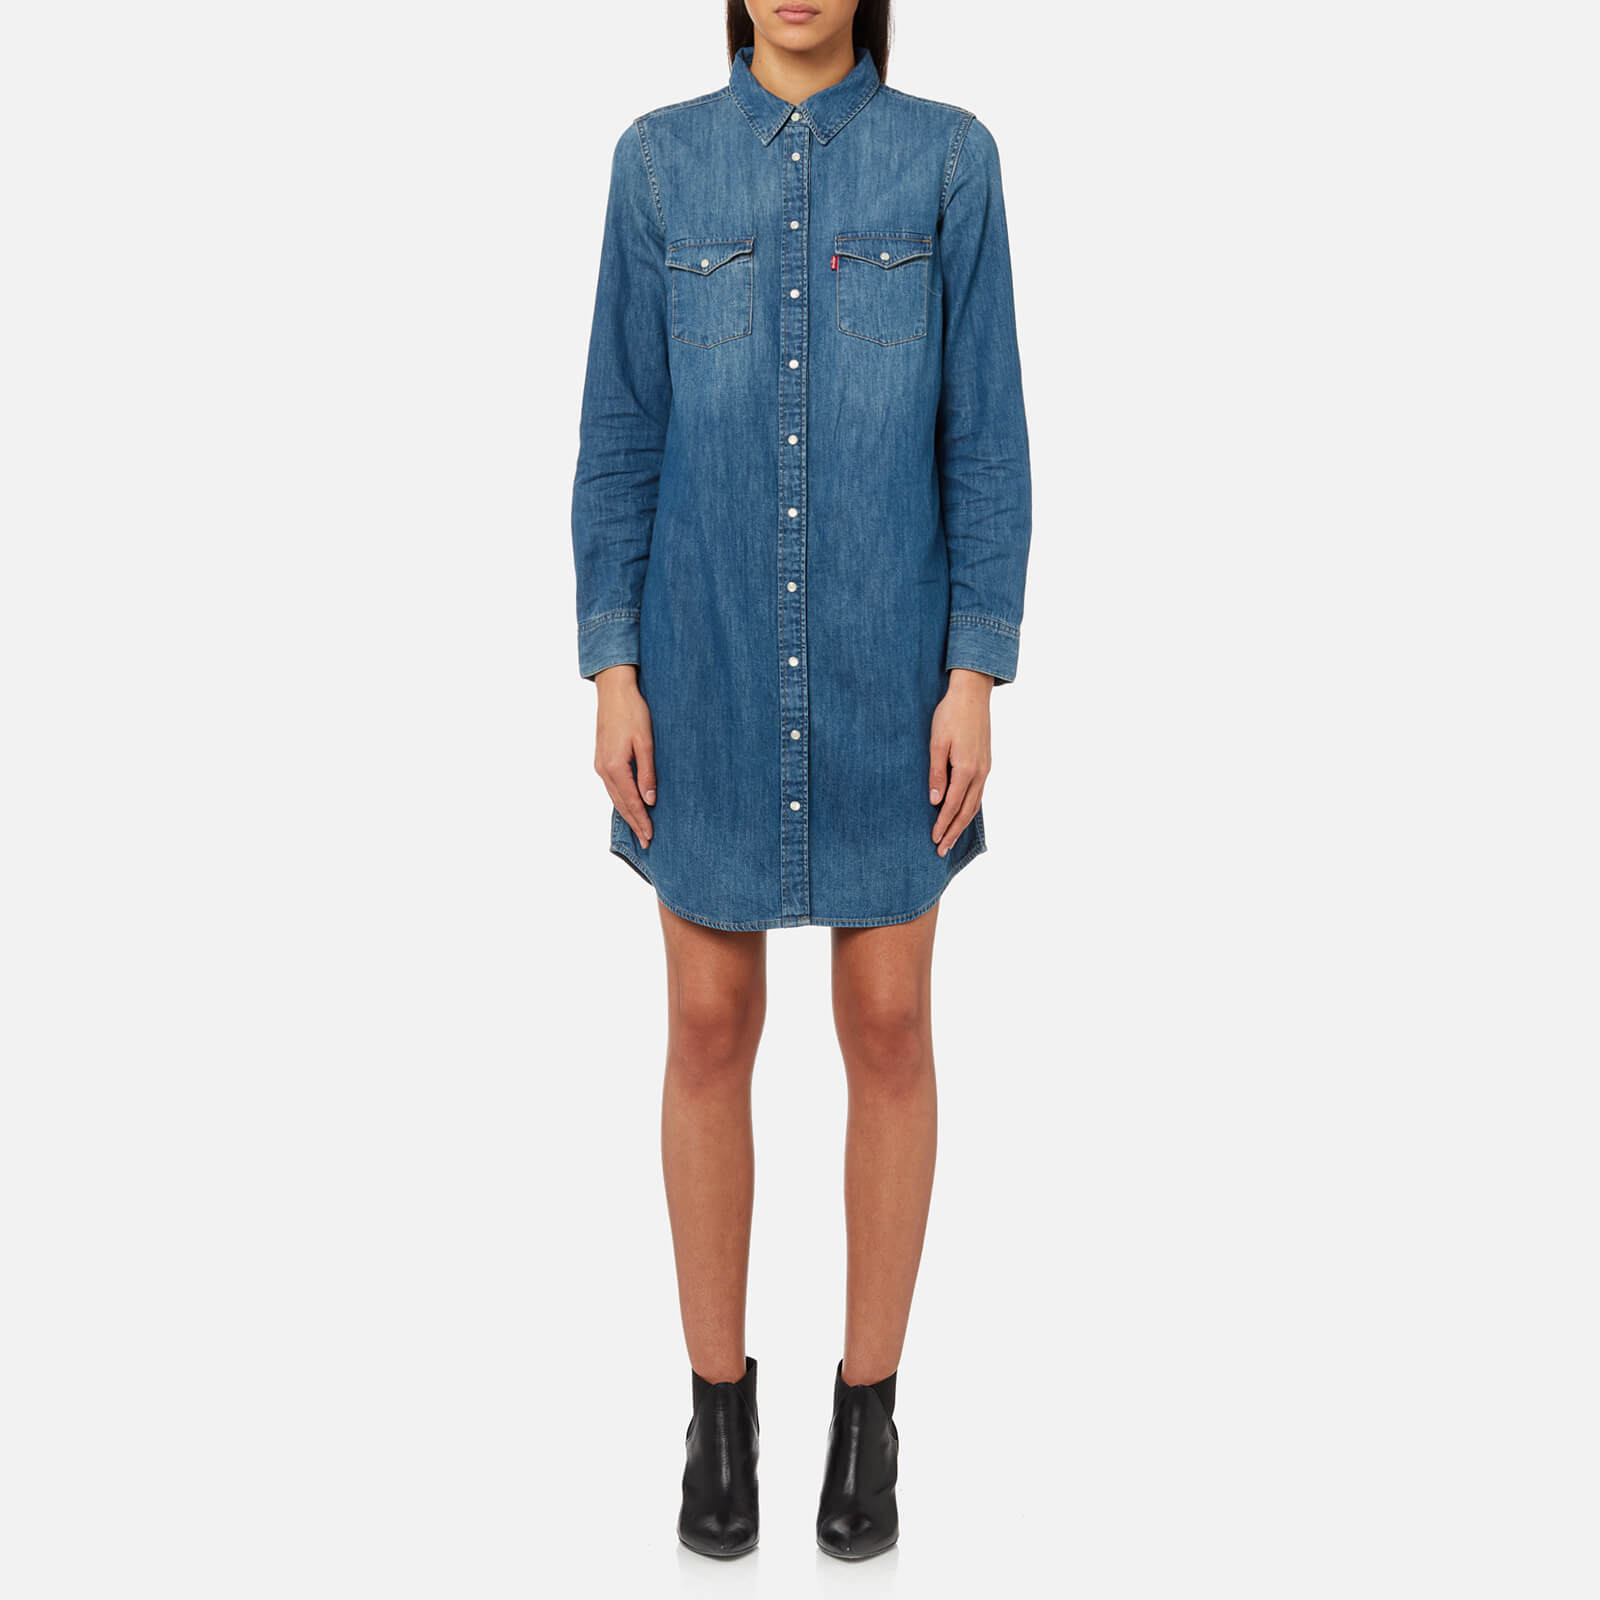 4736425f689 Levi s Women s Iconic Western Shirt Dress - San Fran Medium - Free ...